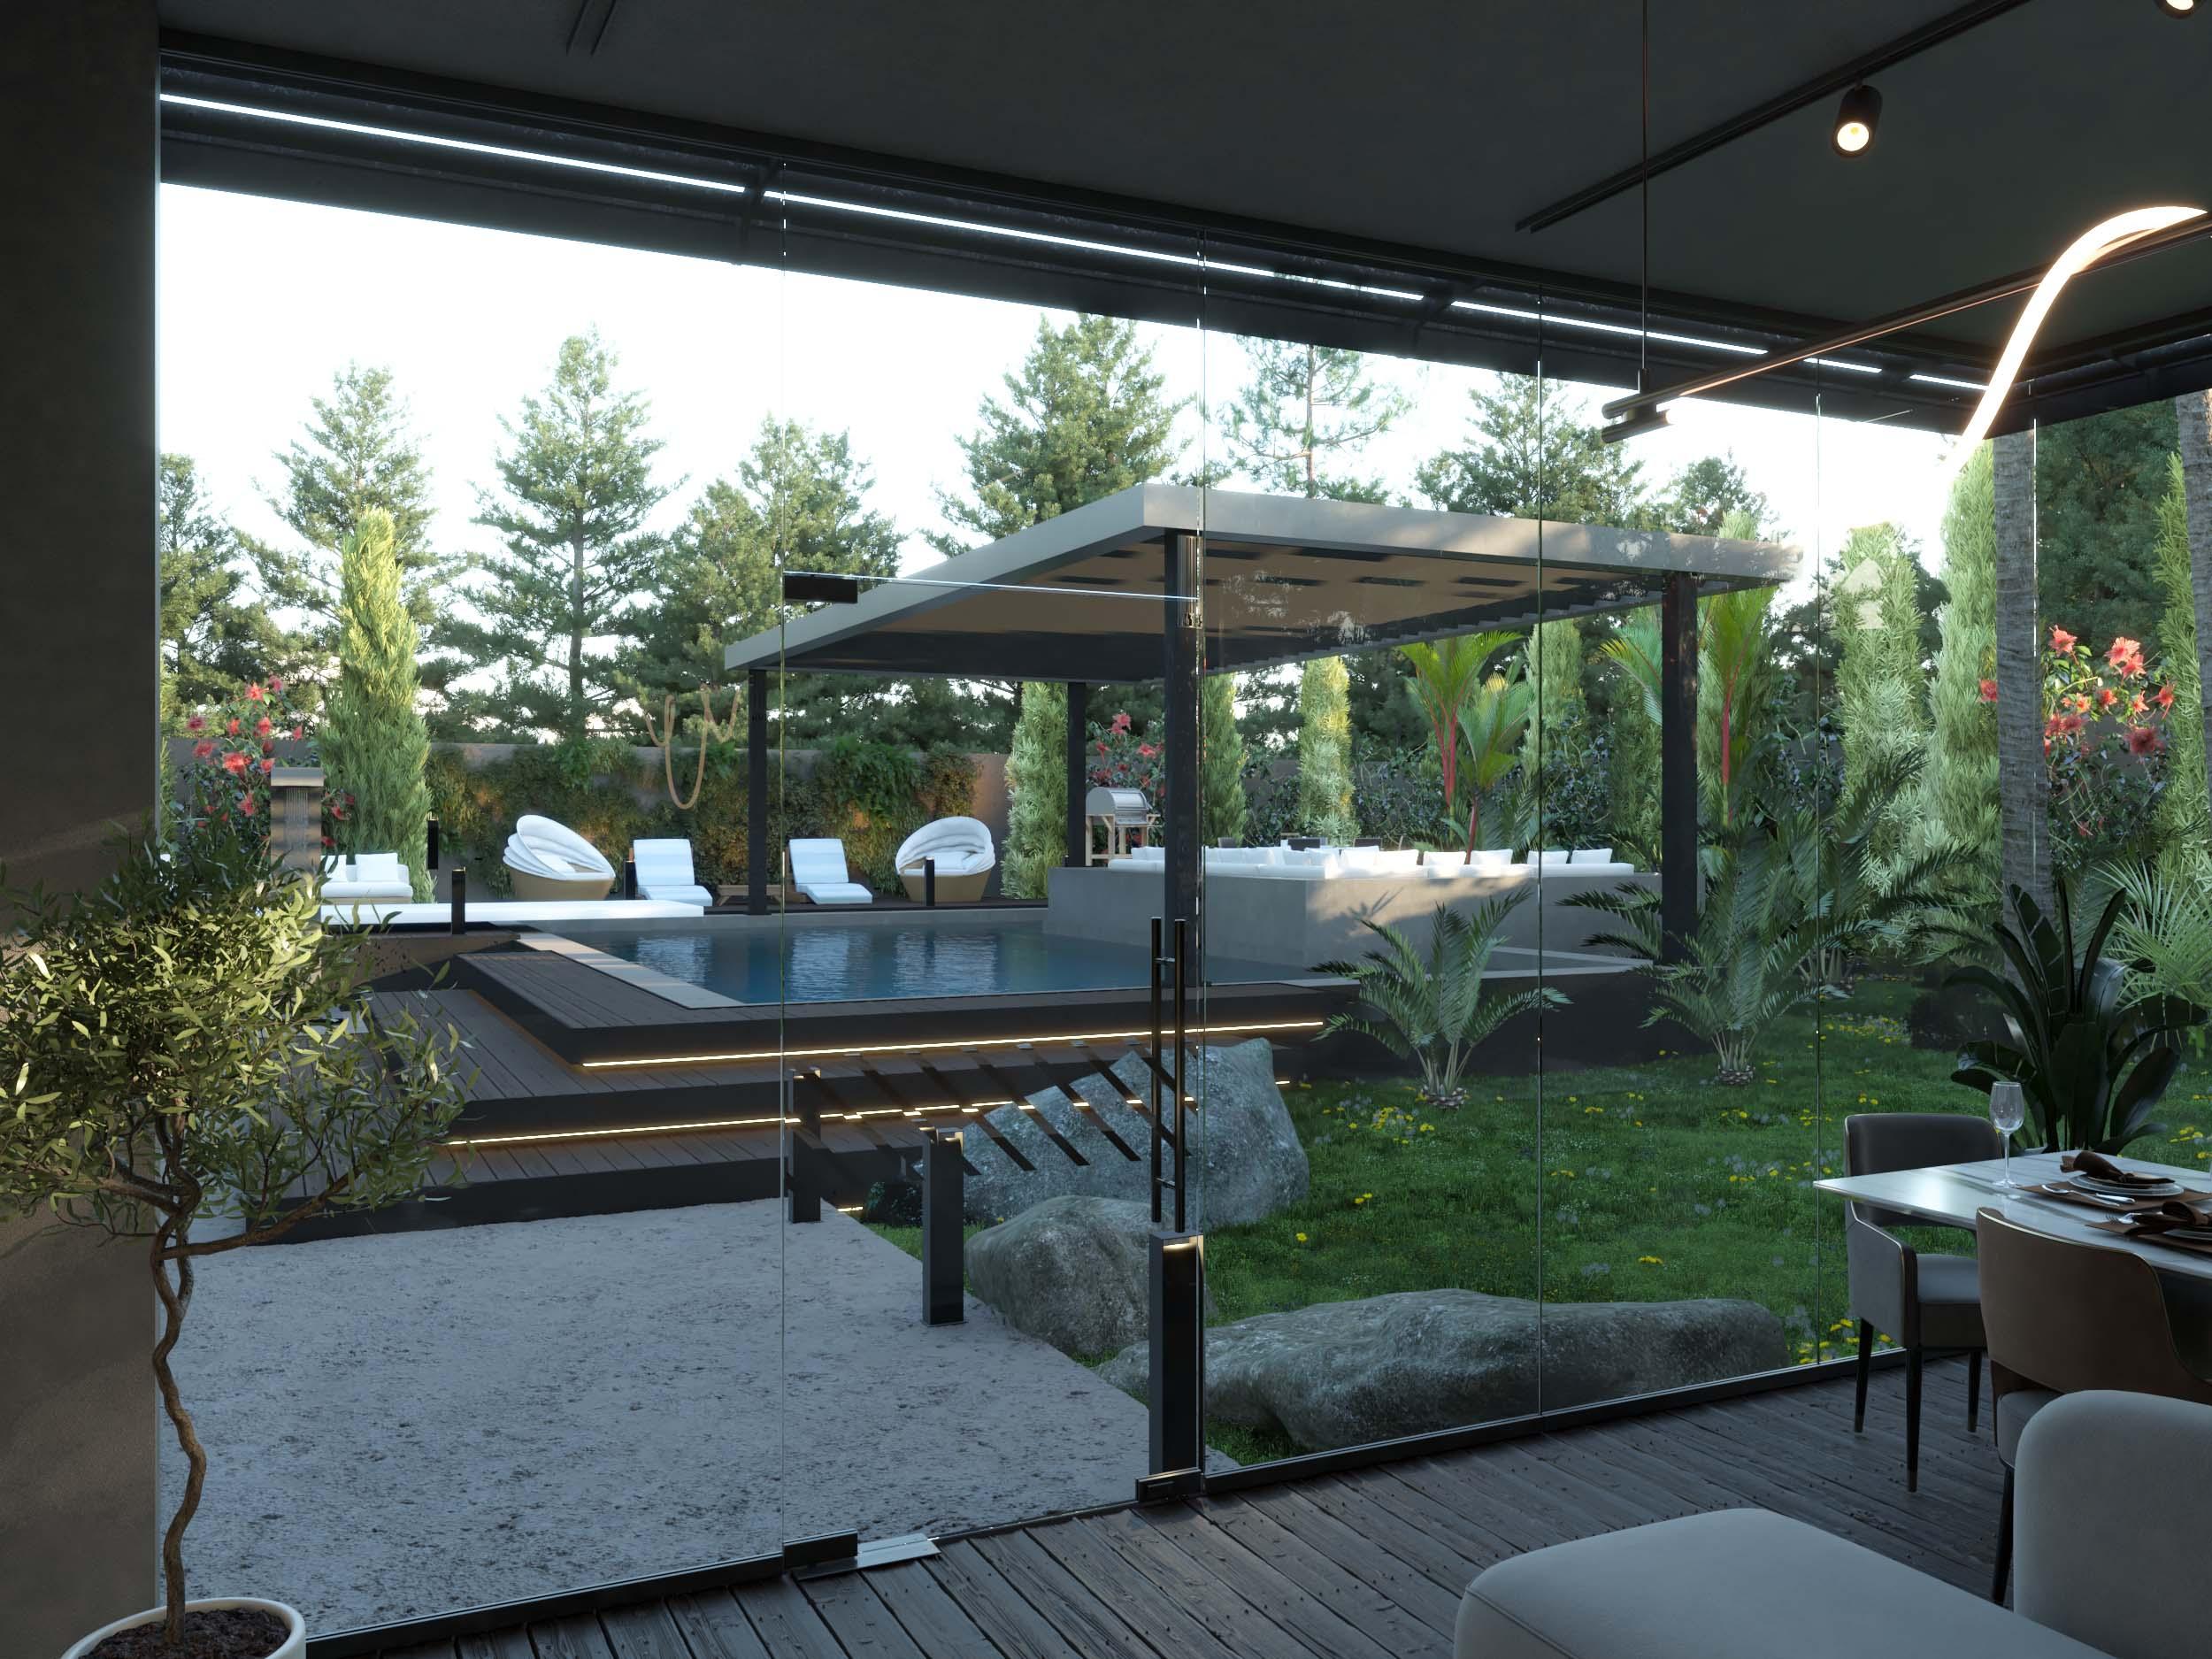 sala - sitting area- view on swimming pool